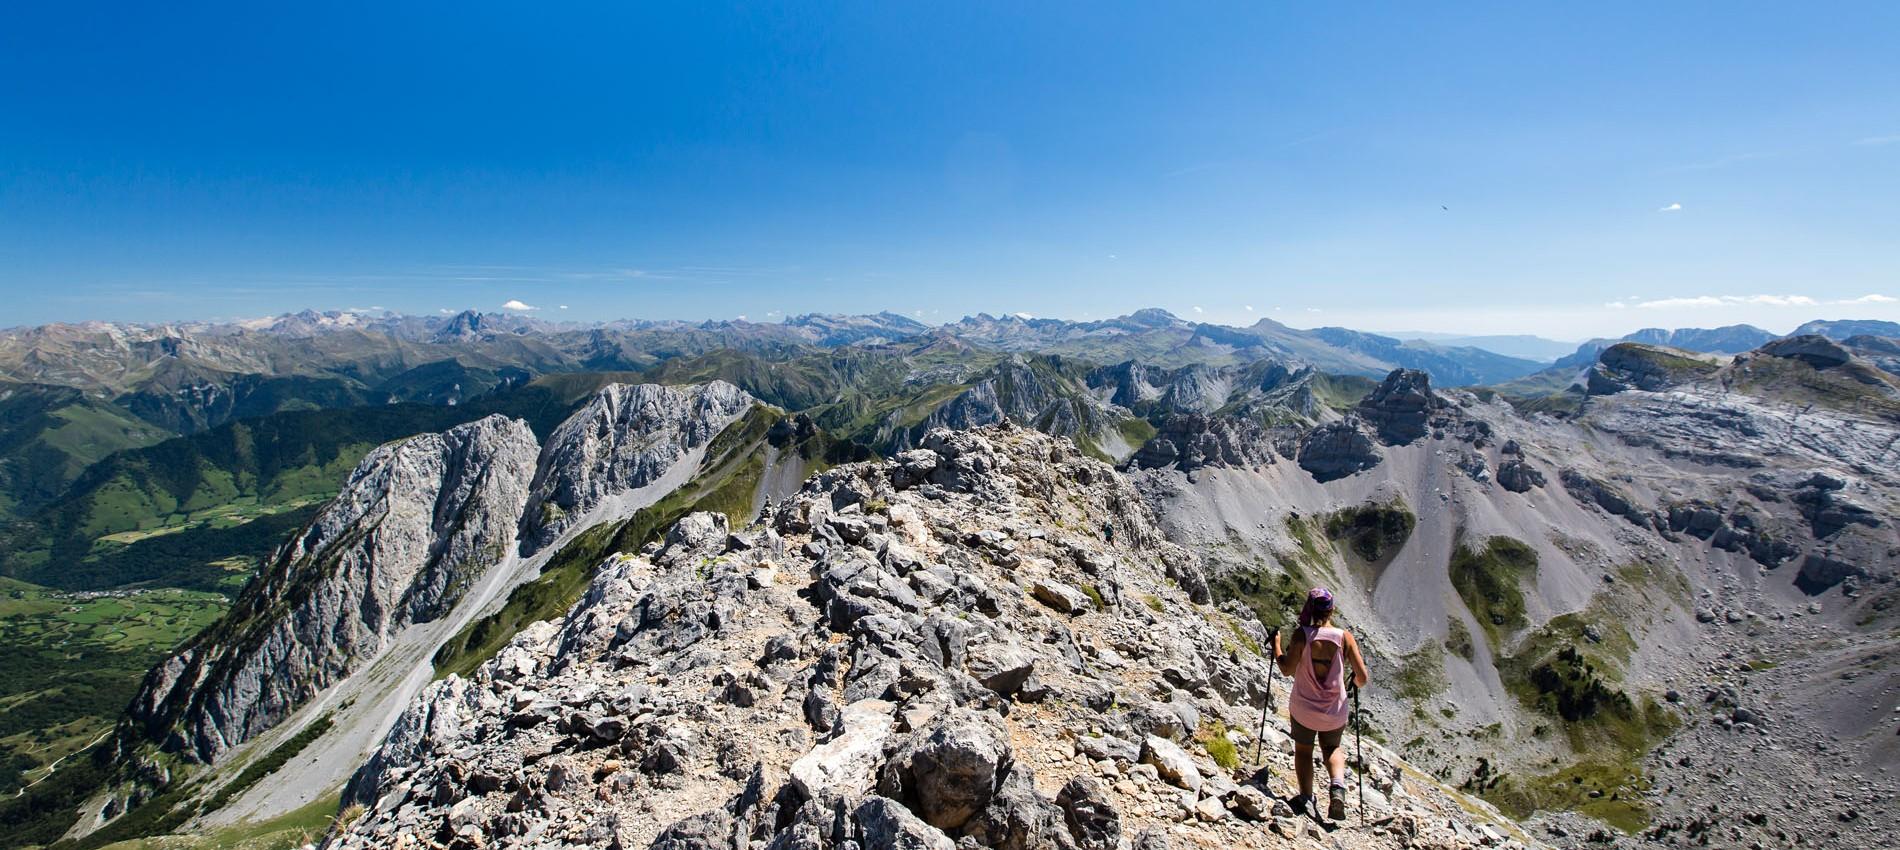 randonnée pyrénées pays basque